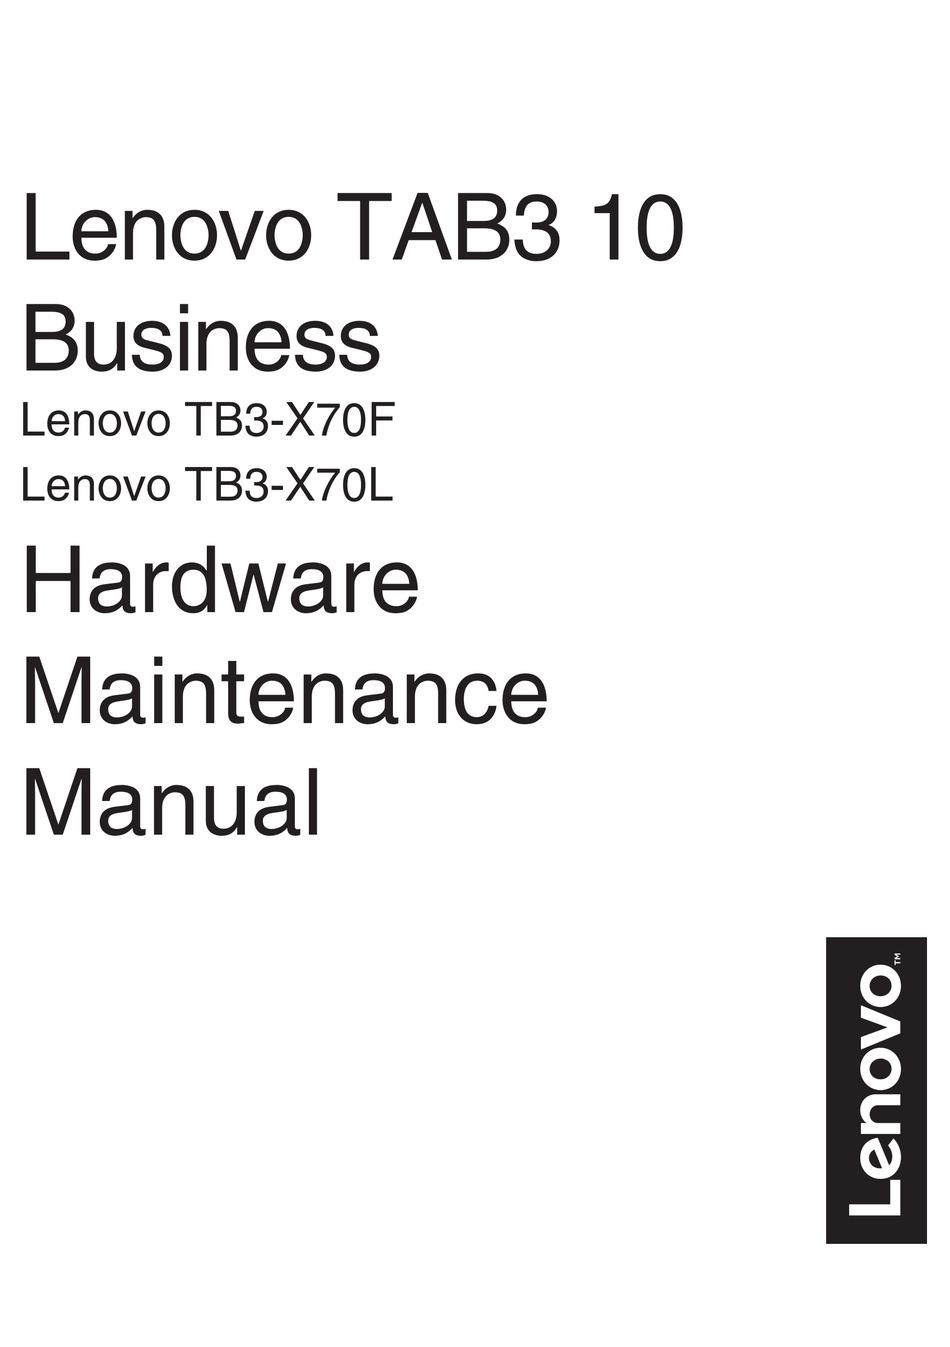 LENOVO TB3-X70F HARDWARE MAINTENANCE MANUAL Pdf Download